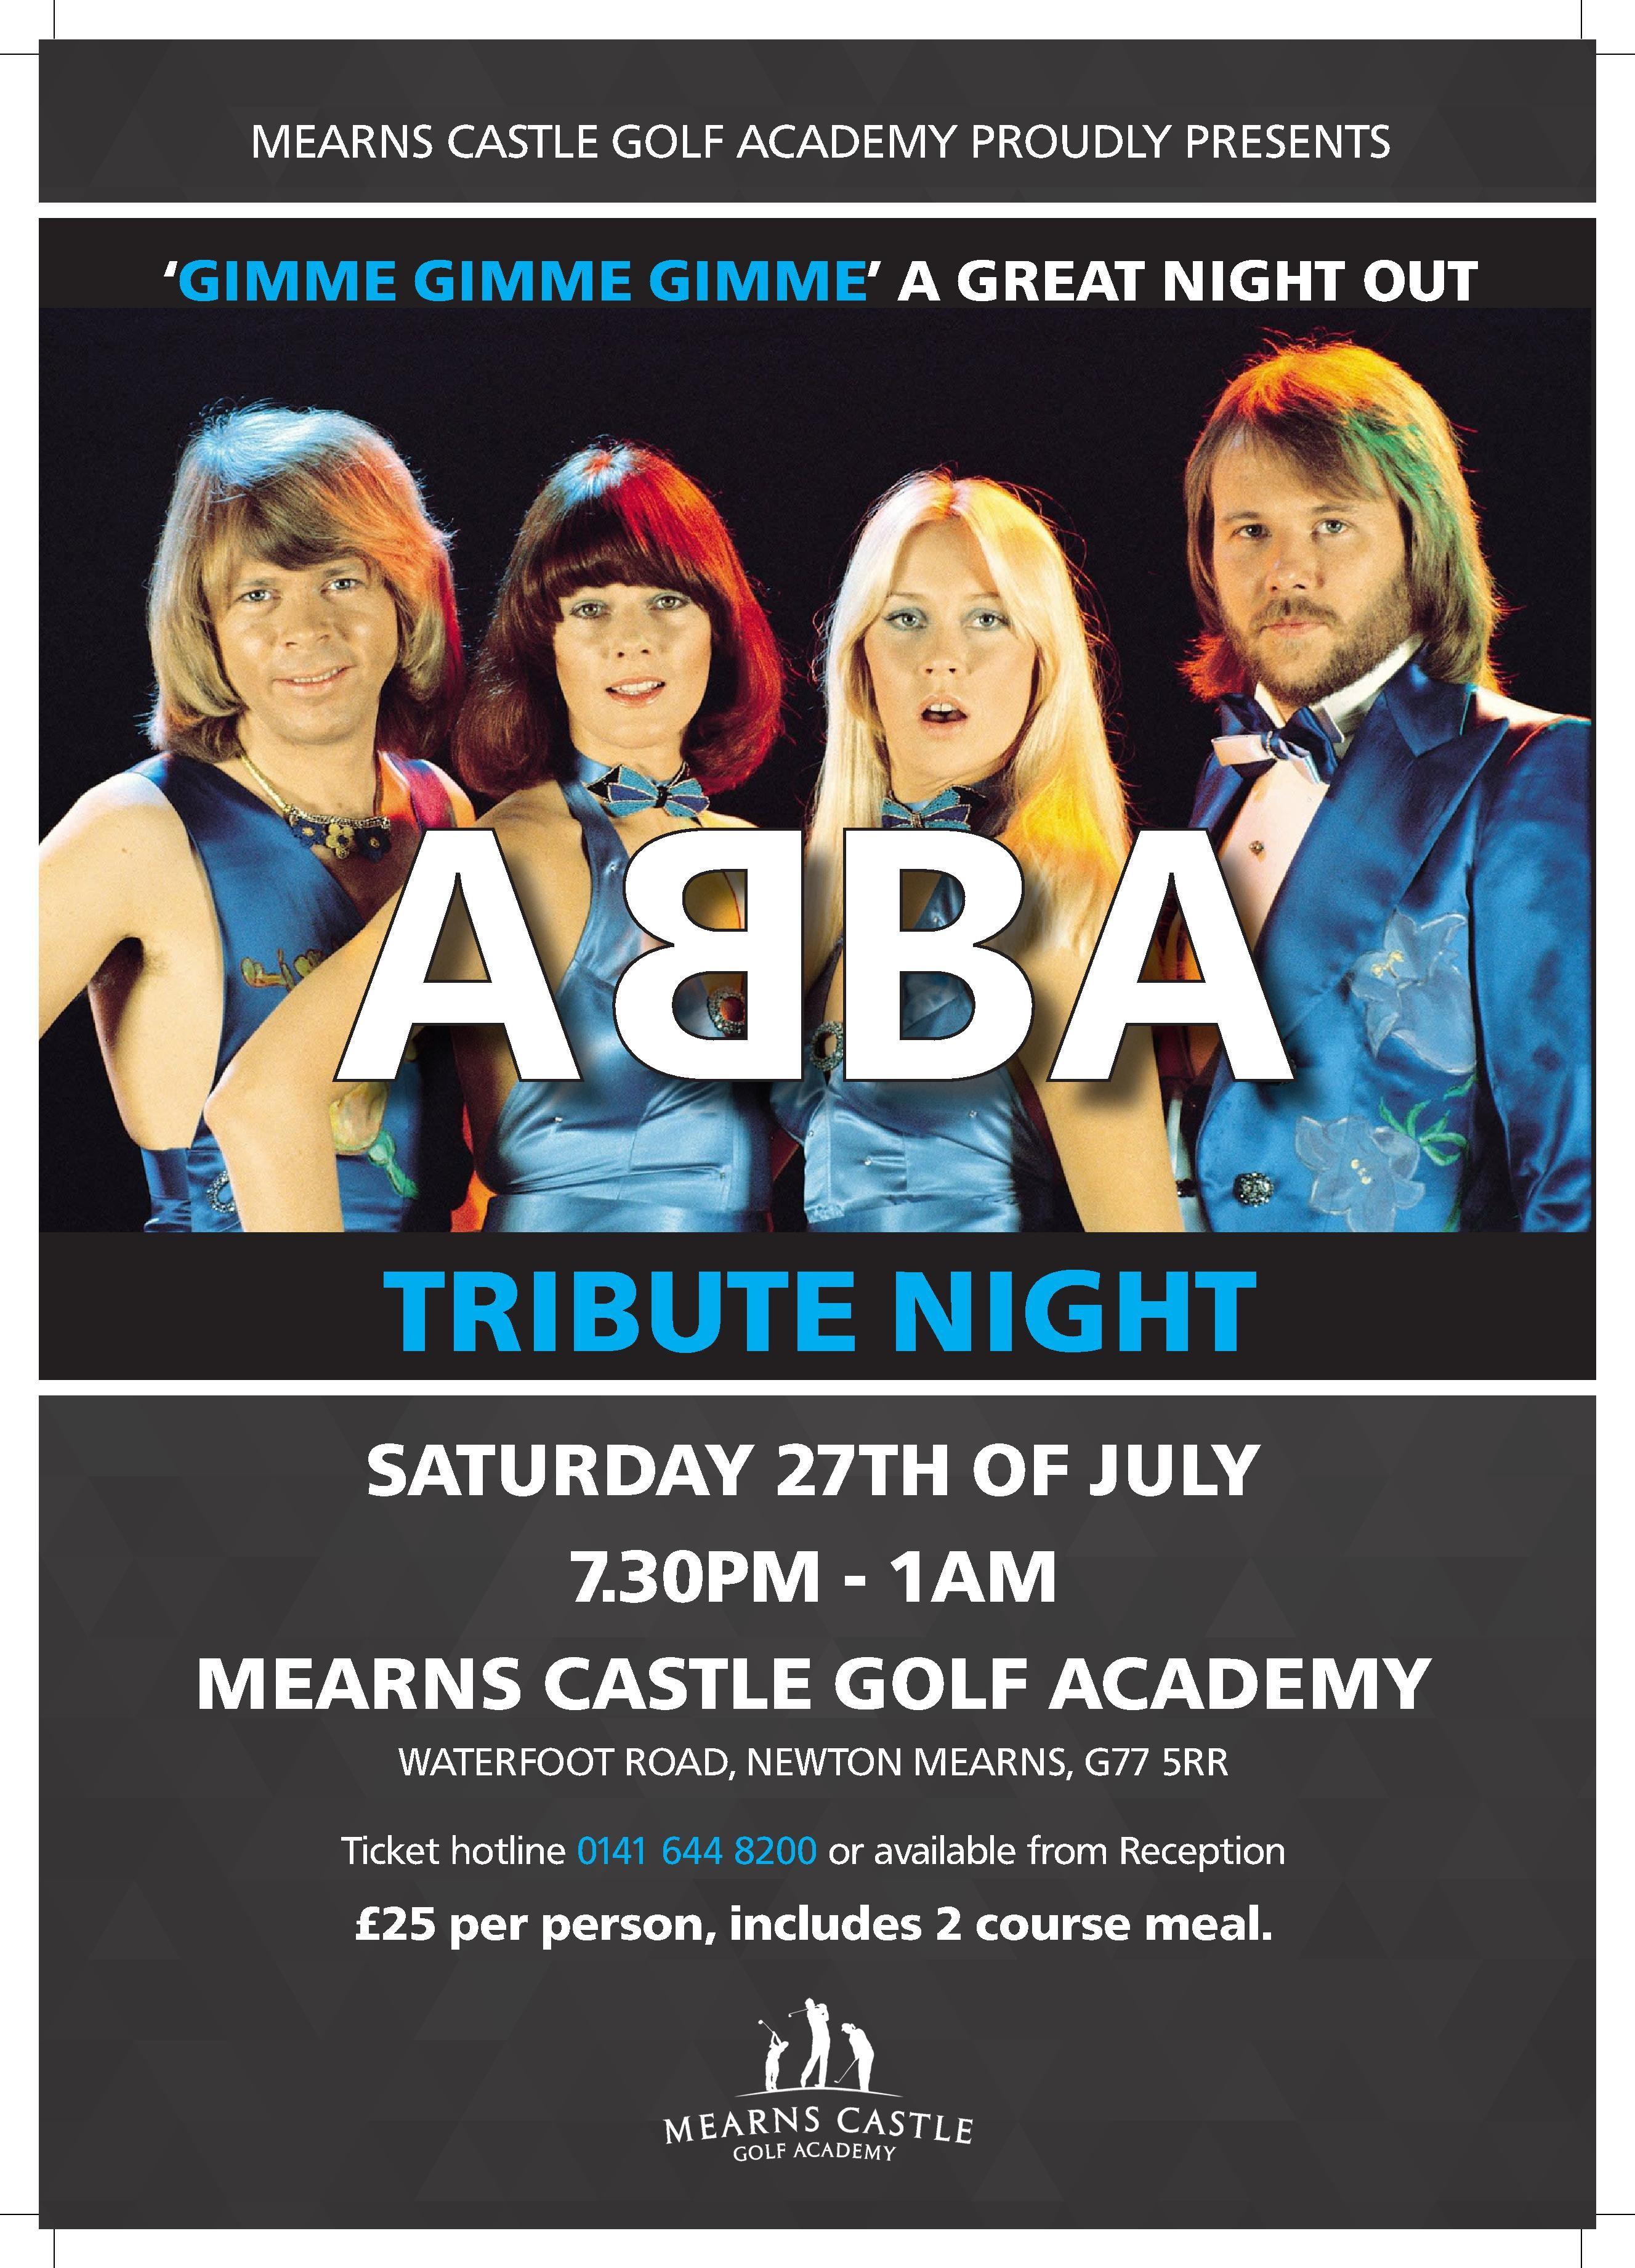 ABBA Tribute Night – Saturday the 27th July